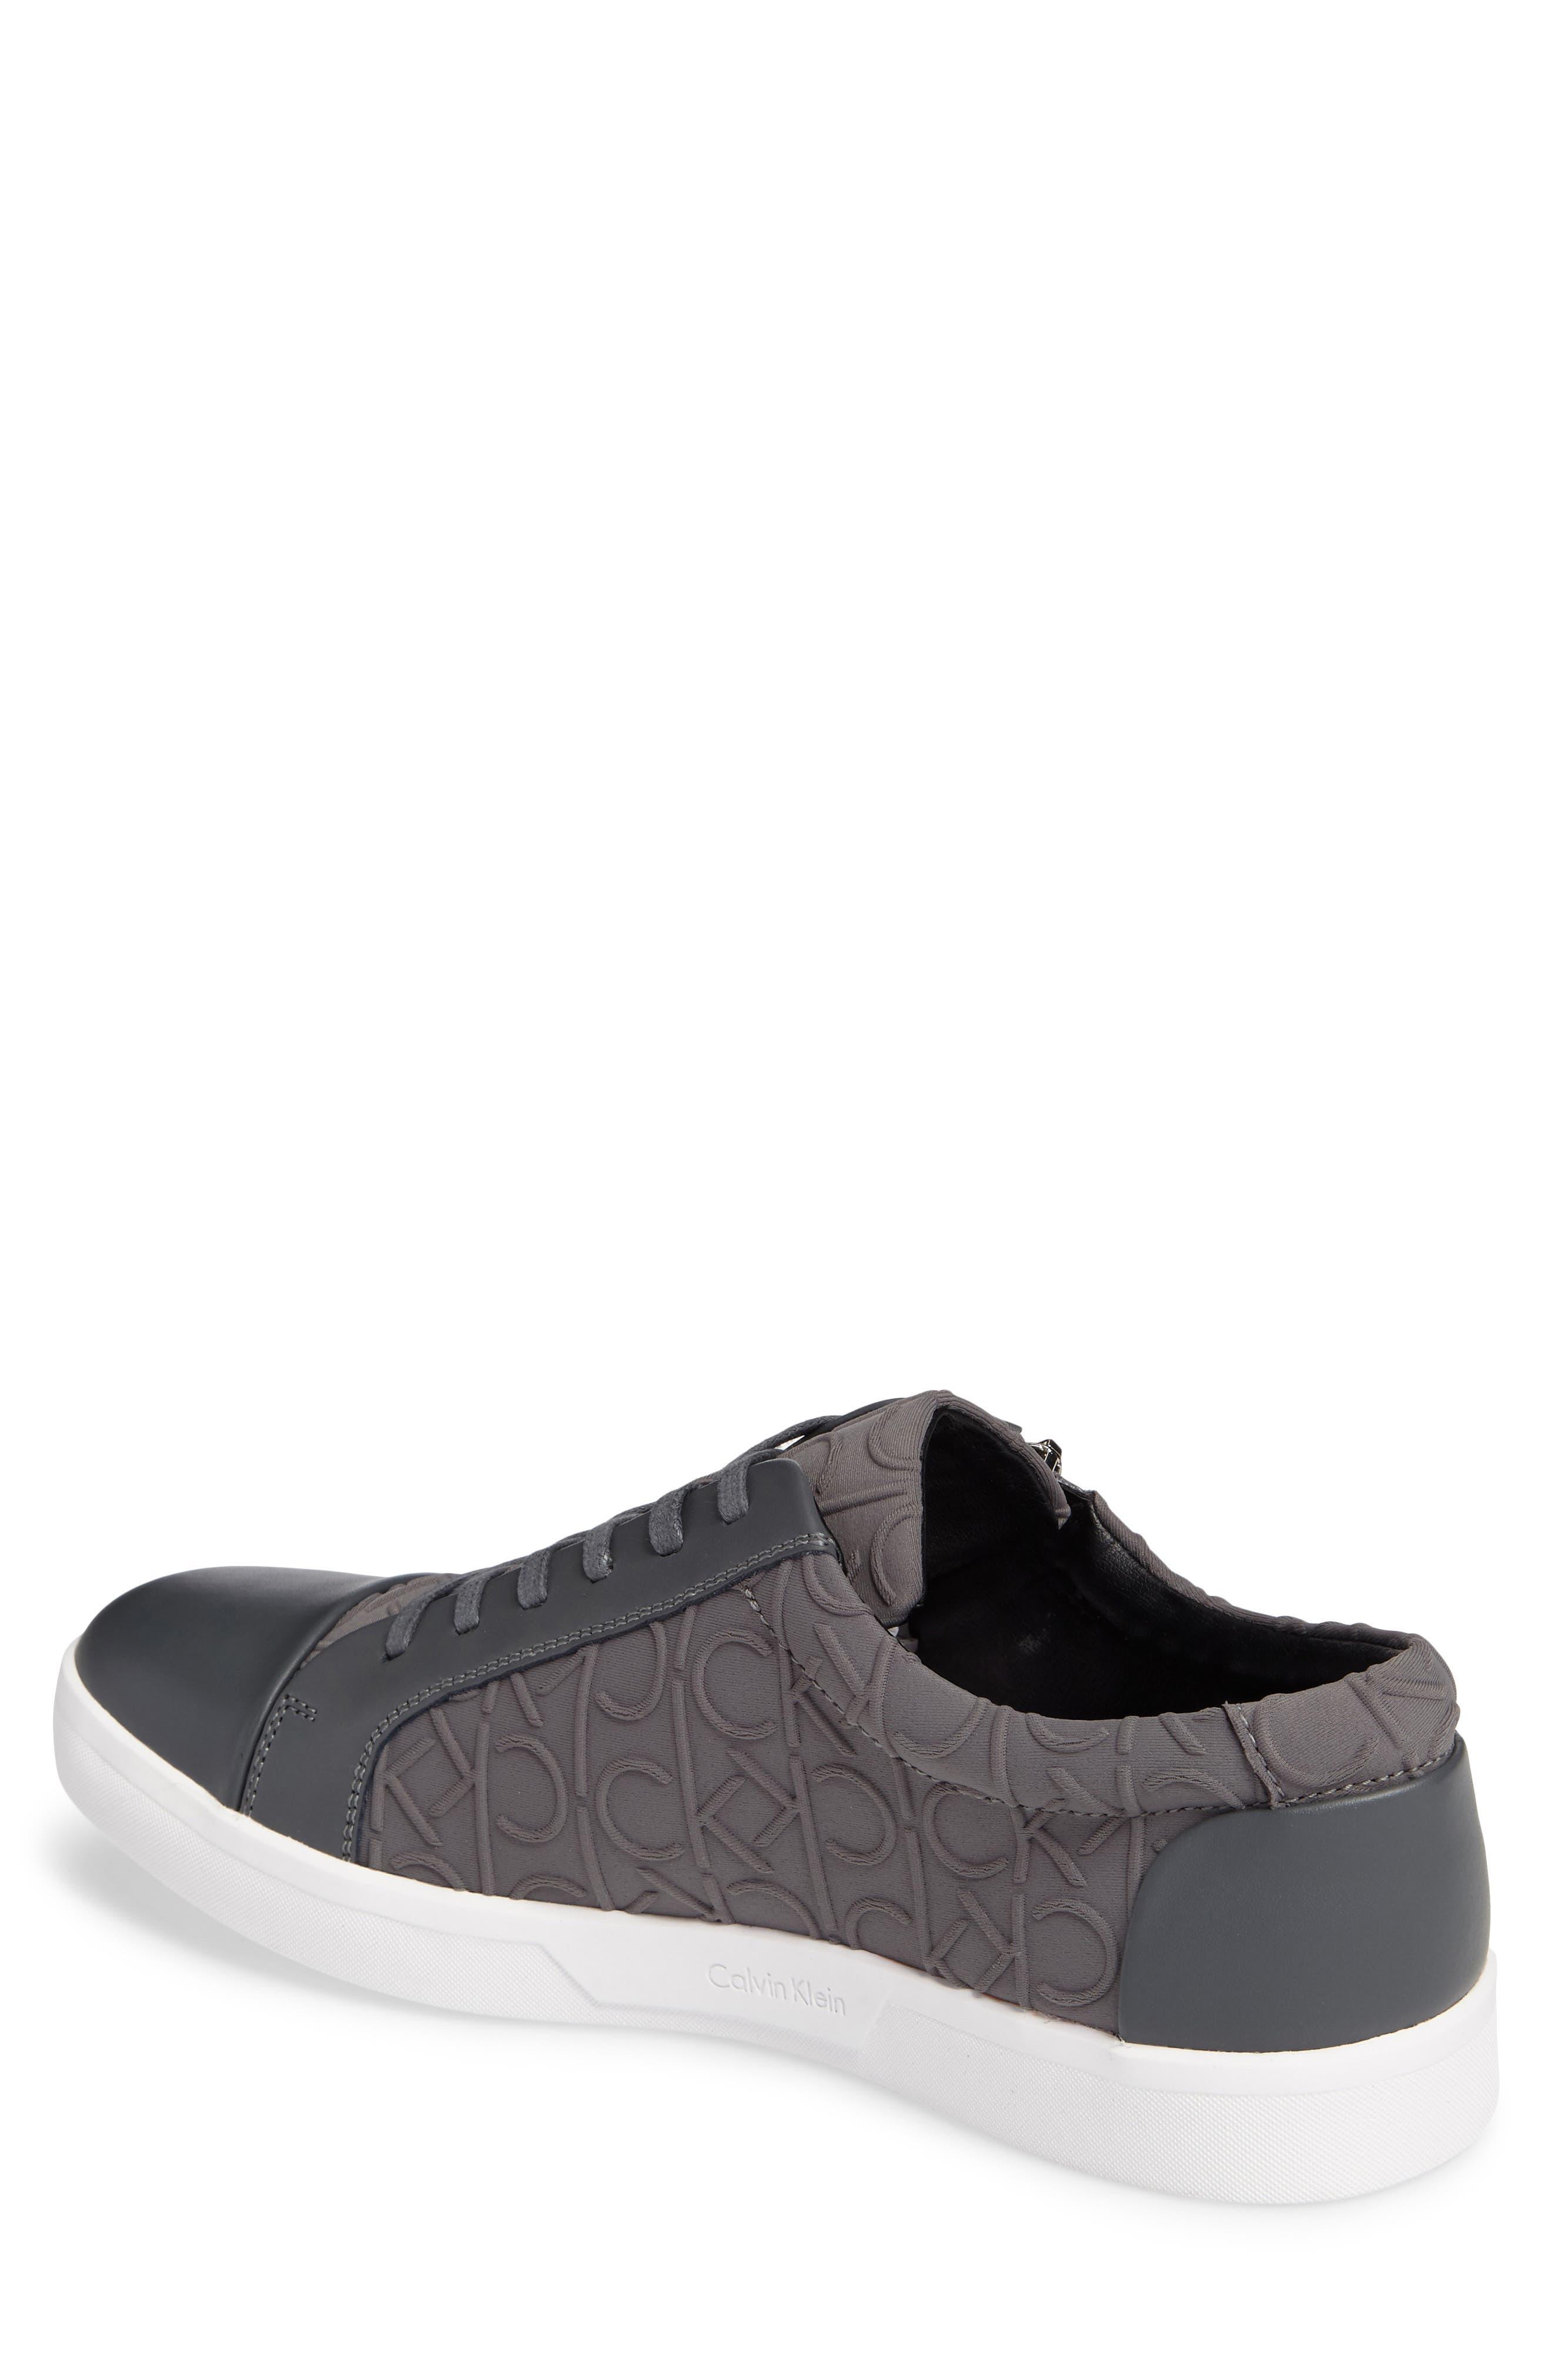 Alternate Image 2  - Calvin Klein Ibrahim Sneaker (Men)